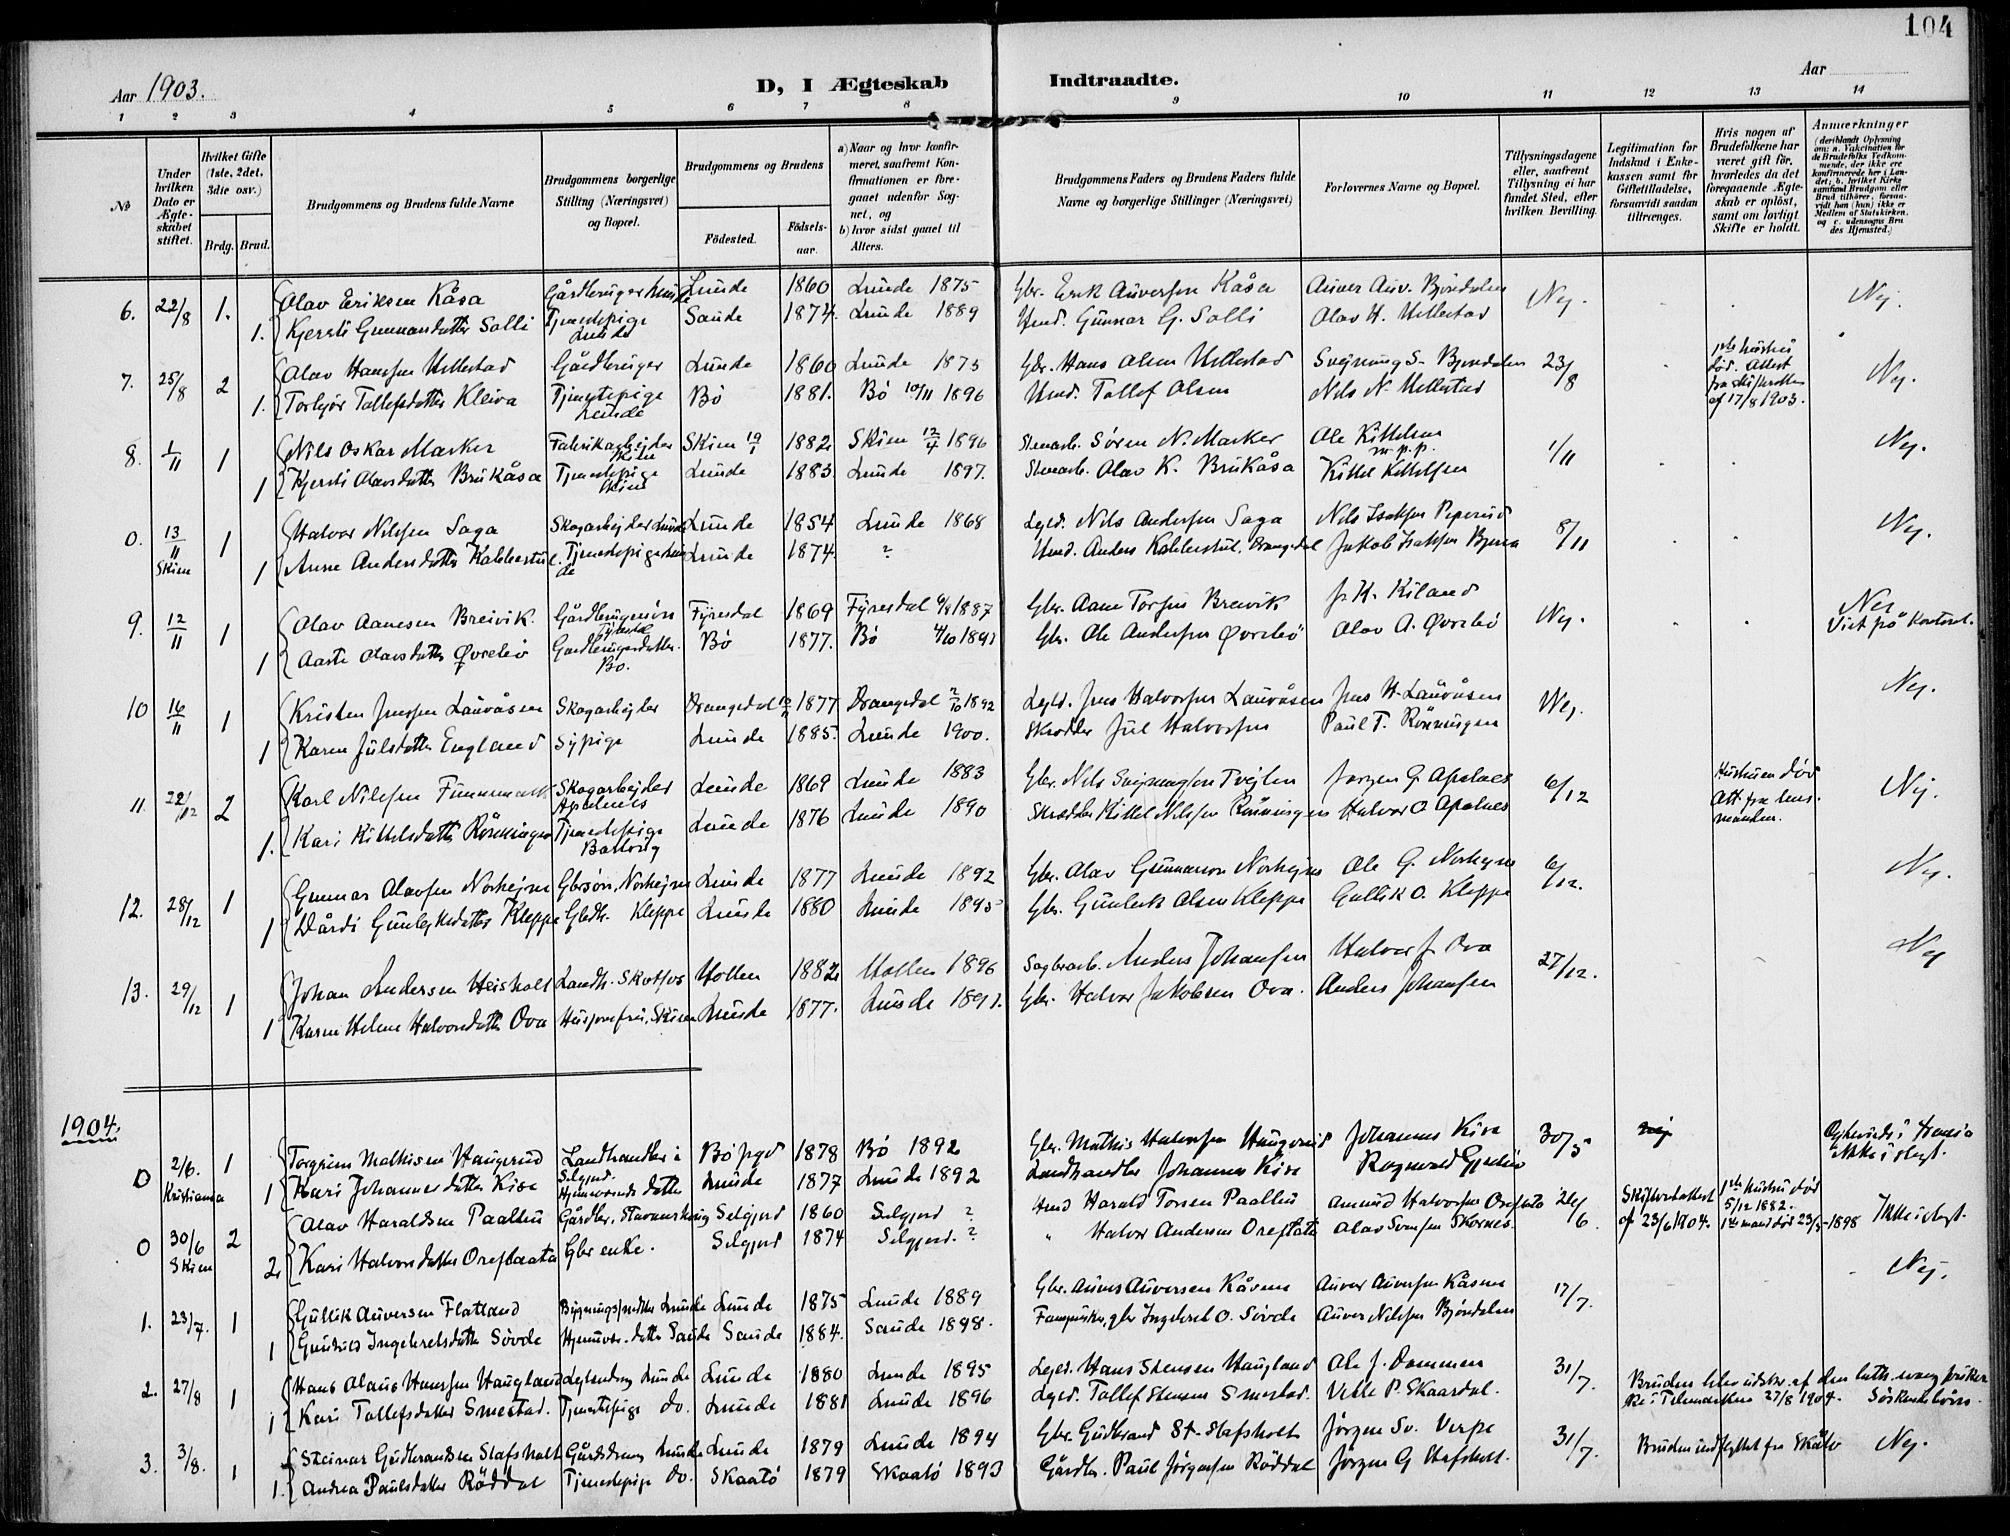 SAKO, Lunde kirkebøker, F/Fa/L0004: Ministerialbok nr. I 4, 1902-1913, s. 104